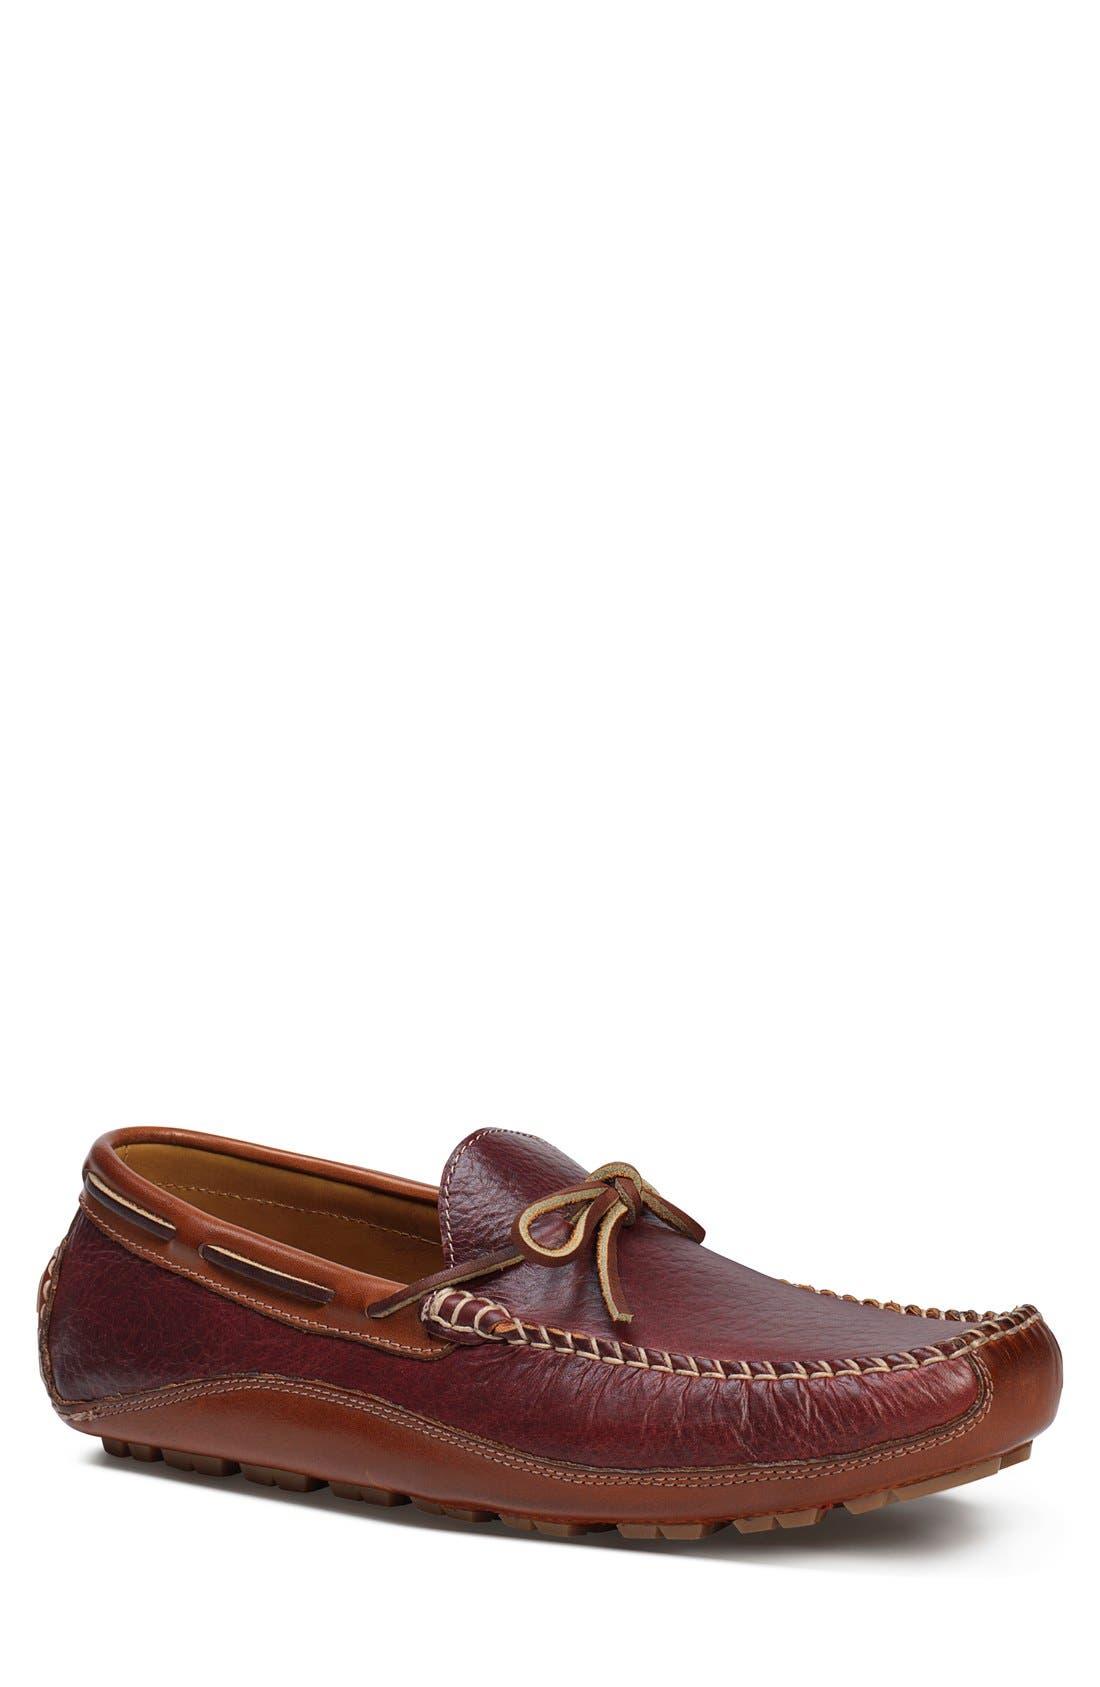 'Drake' Leather Driving Shoe,                             Main thumbnail 15, color,